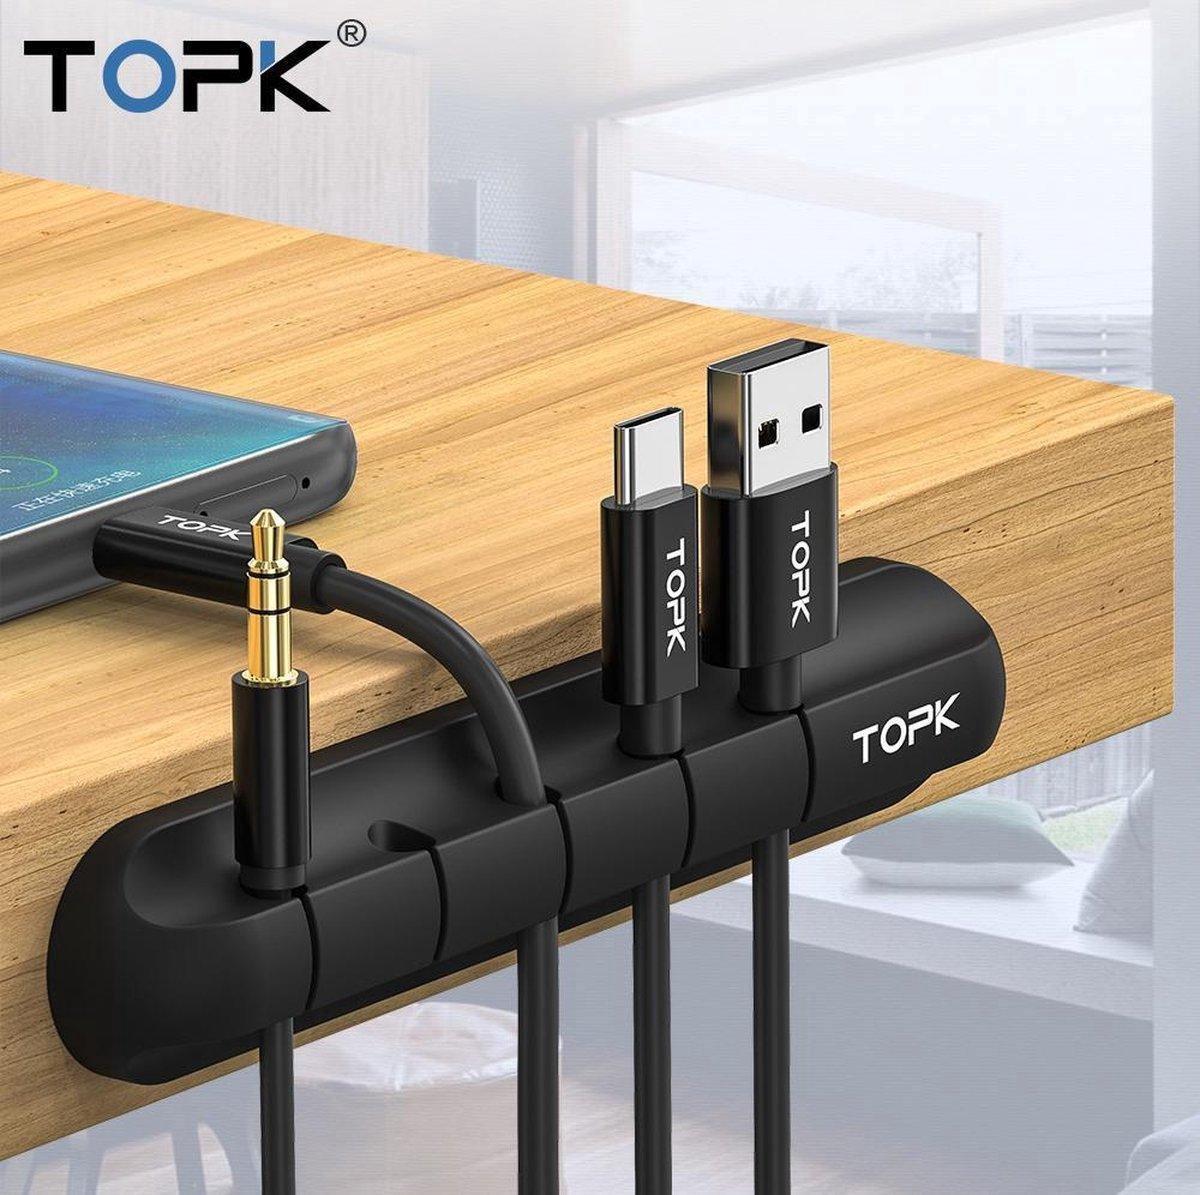 Zwarte kabelhouder, kabelclip voor 5 kabels, kabelorganizer, bureau organizer